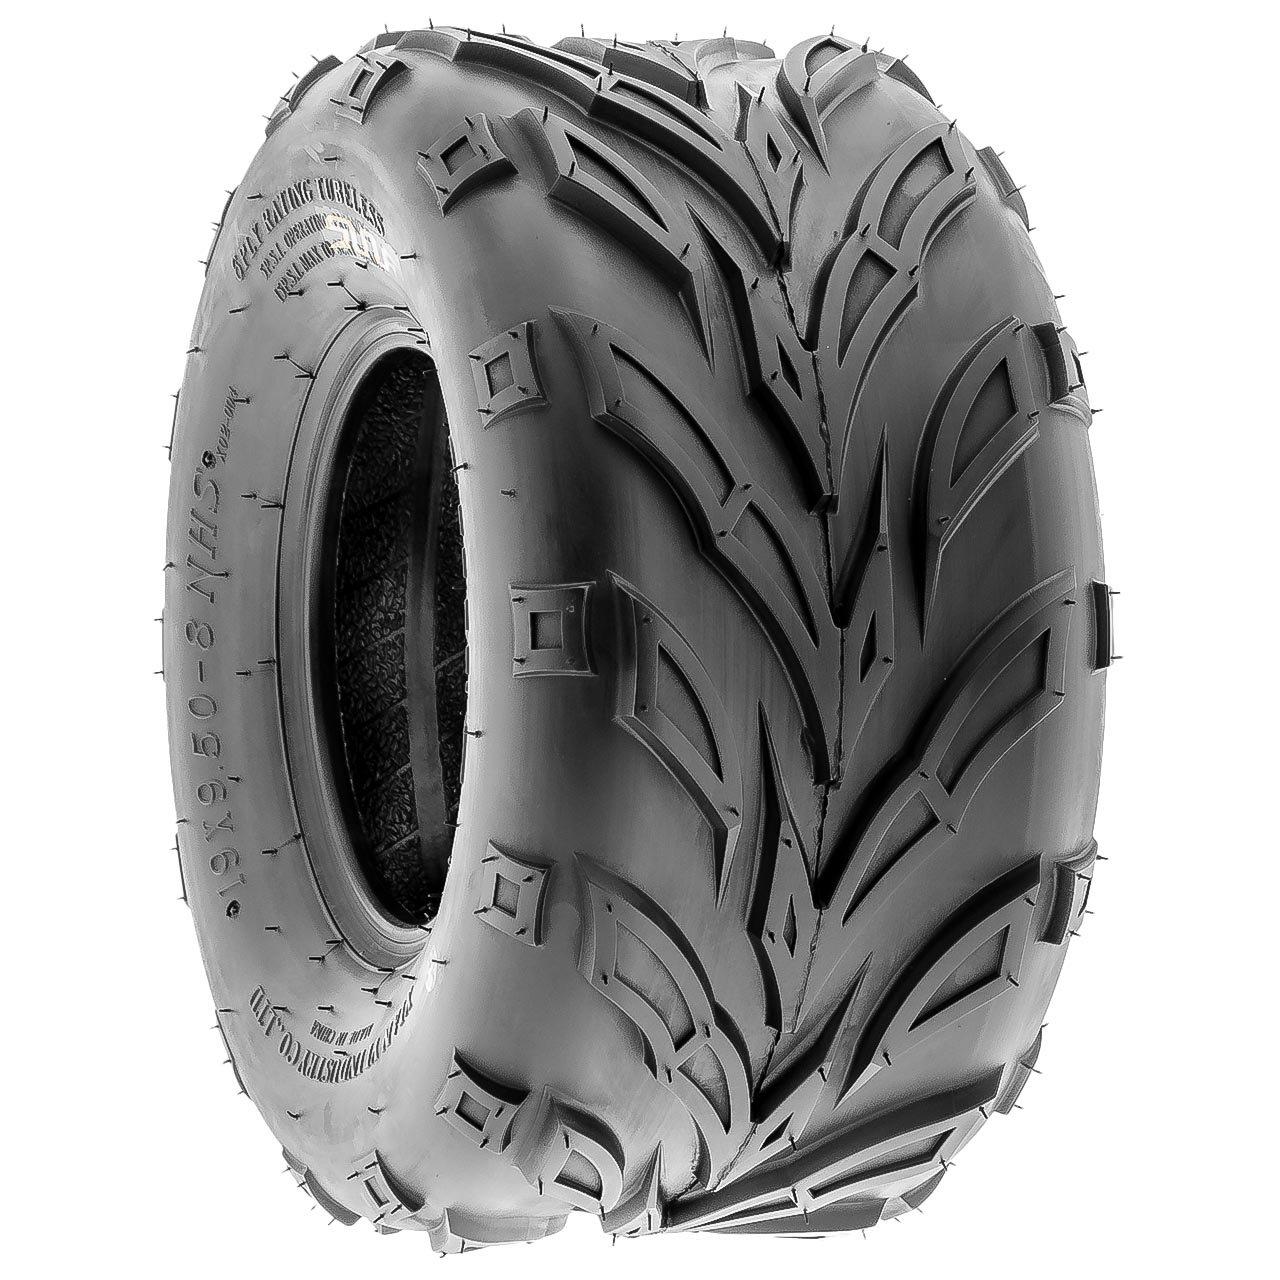 SunF A004 ATV UTV Off-Road Tire 19x9.5-8, 6 PR, Track & Trail, Tubeless